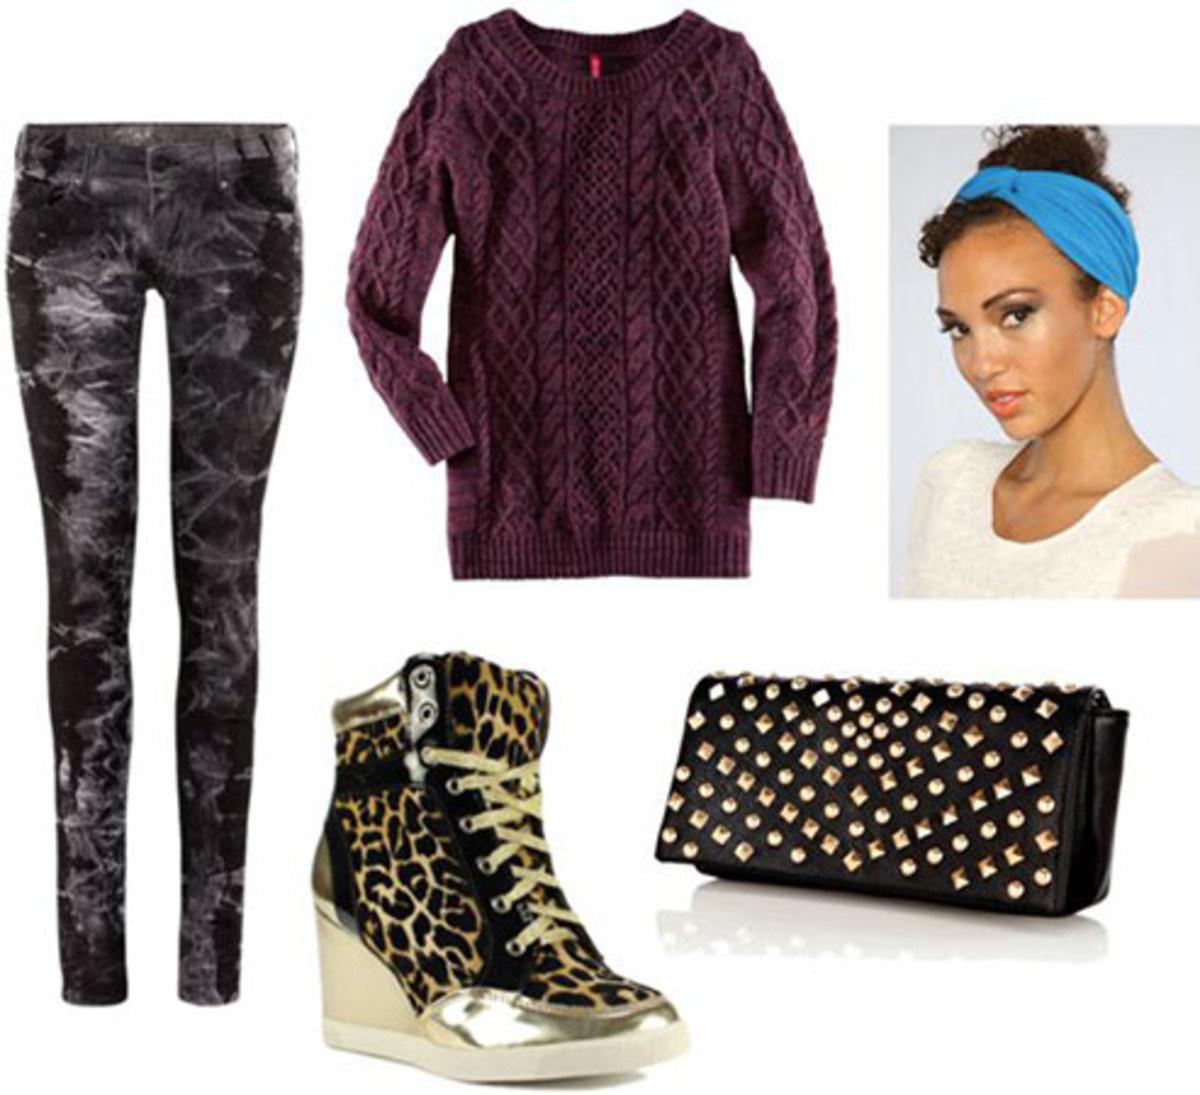 grayd-leggings-purple-royal-sweater-black-bag-clutch-head-tan-shoe-sneakers-leopard-print-fall-winter-weekend.jpg